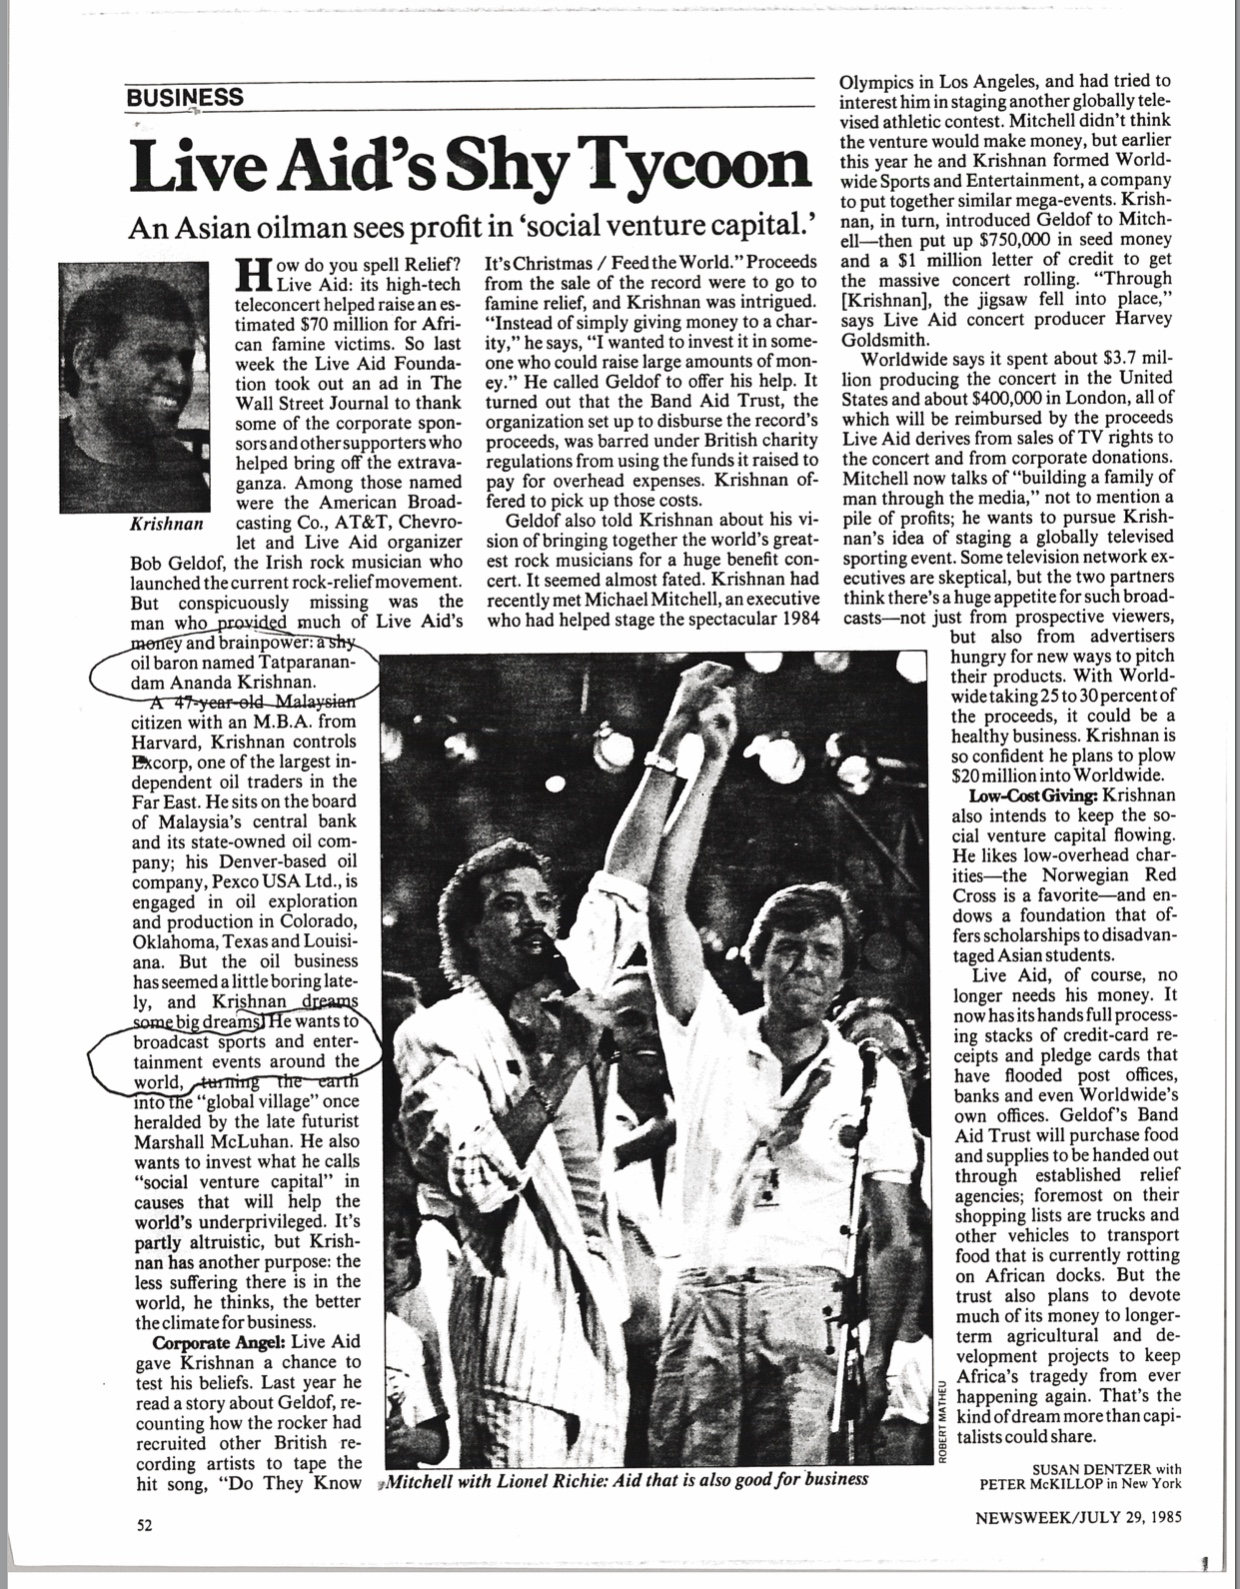 Newsweek article about ananda Krishnan